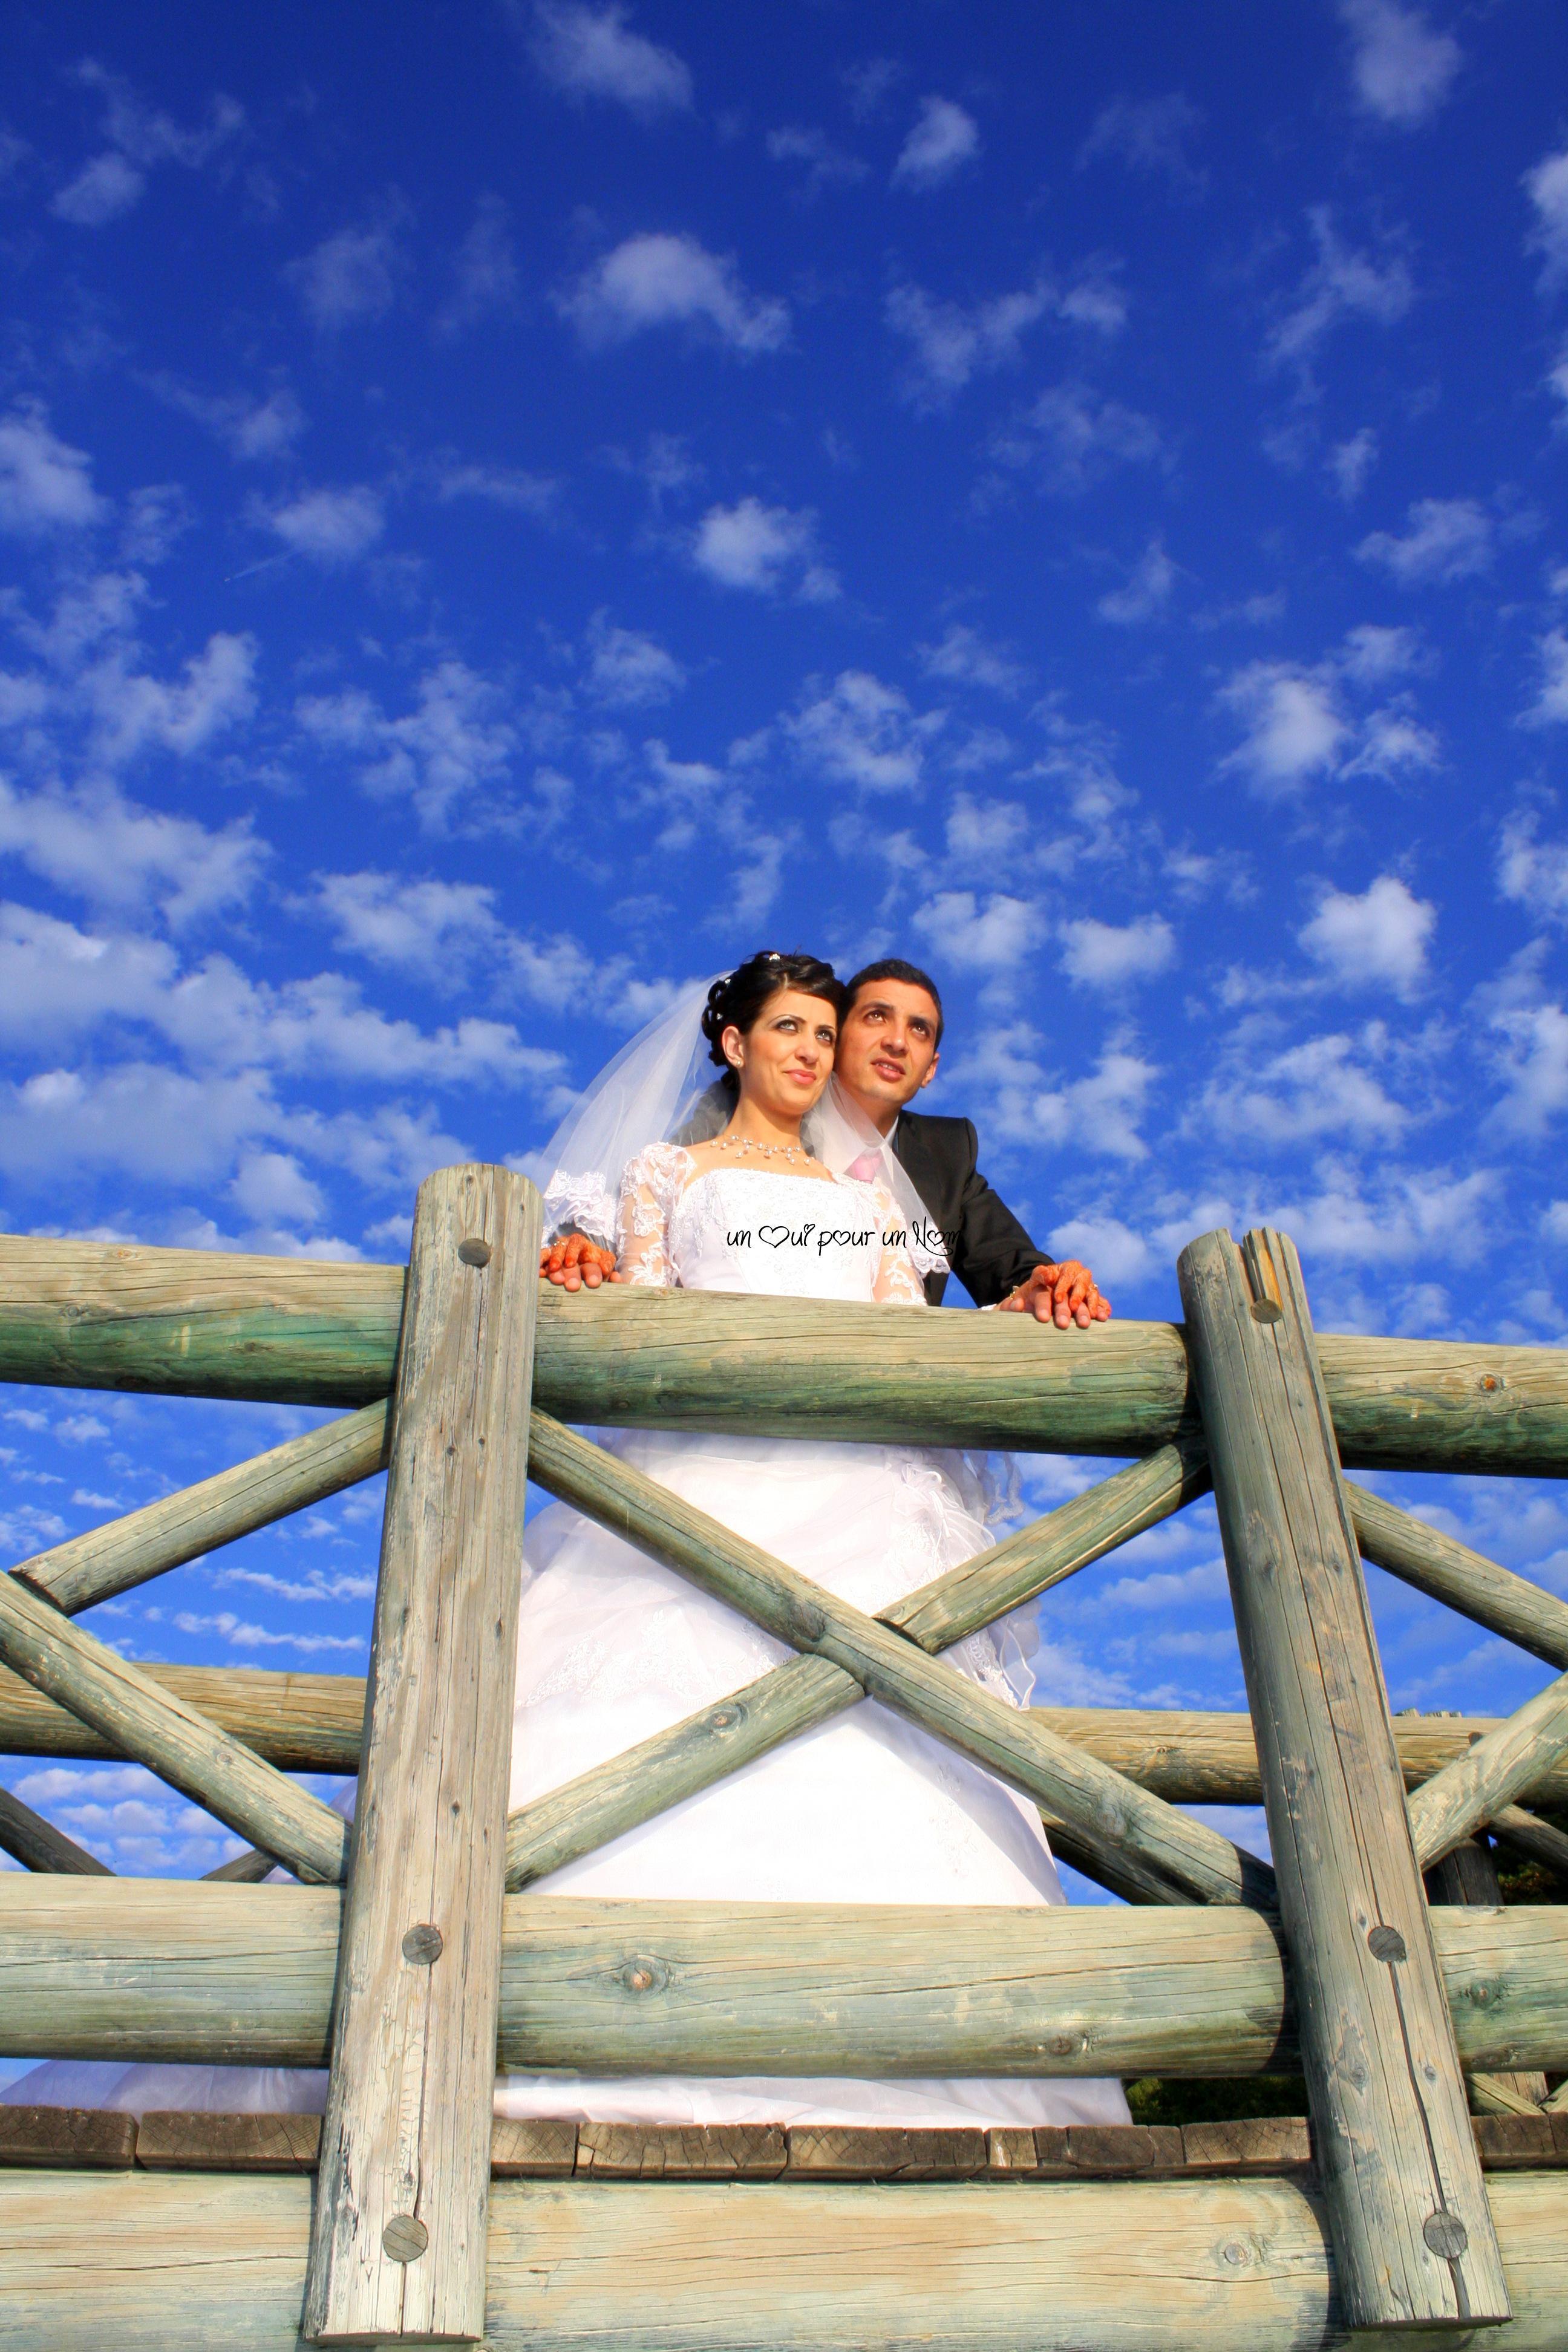 photographe cameraman mariage oriental arabe musulman montlimar - Photographe Cameraman Mariage Oriental